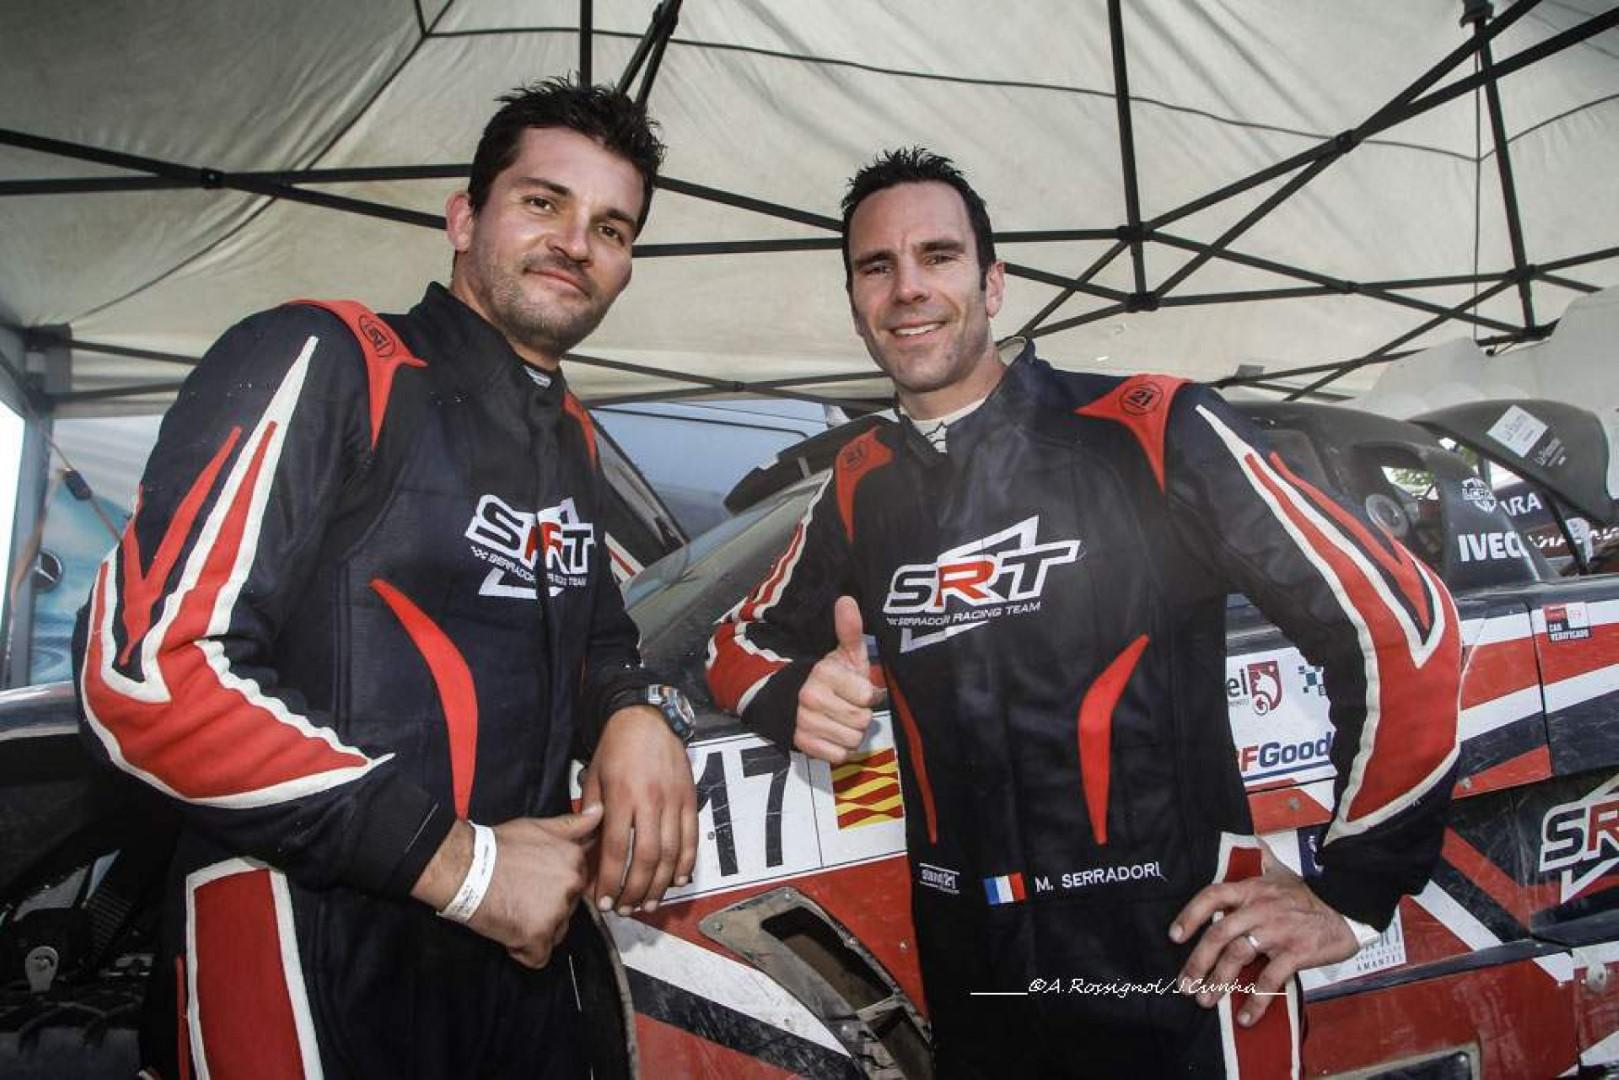 Baja Aragon 2017: Victoire en 2 roues motrices pour Serradori Racing Team